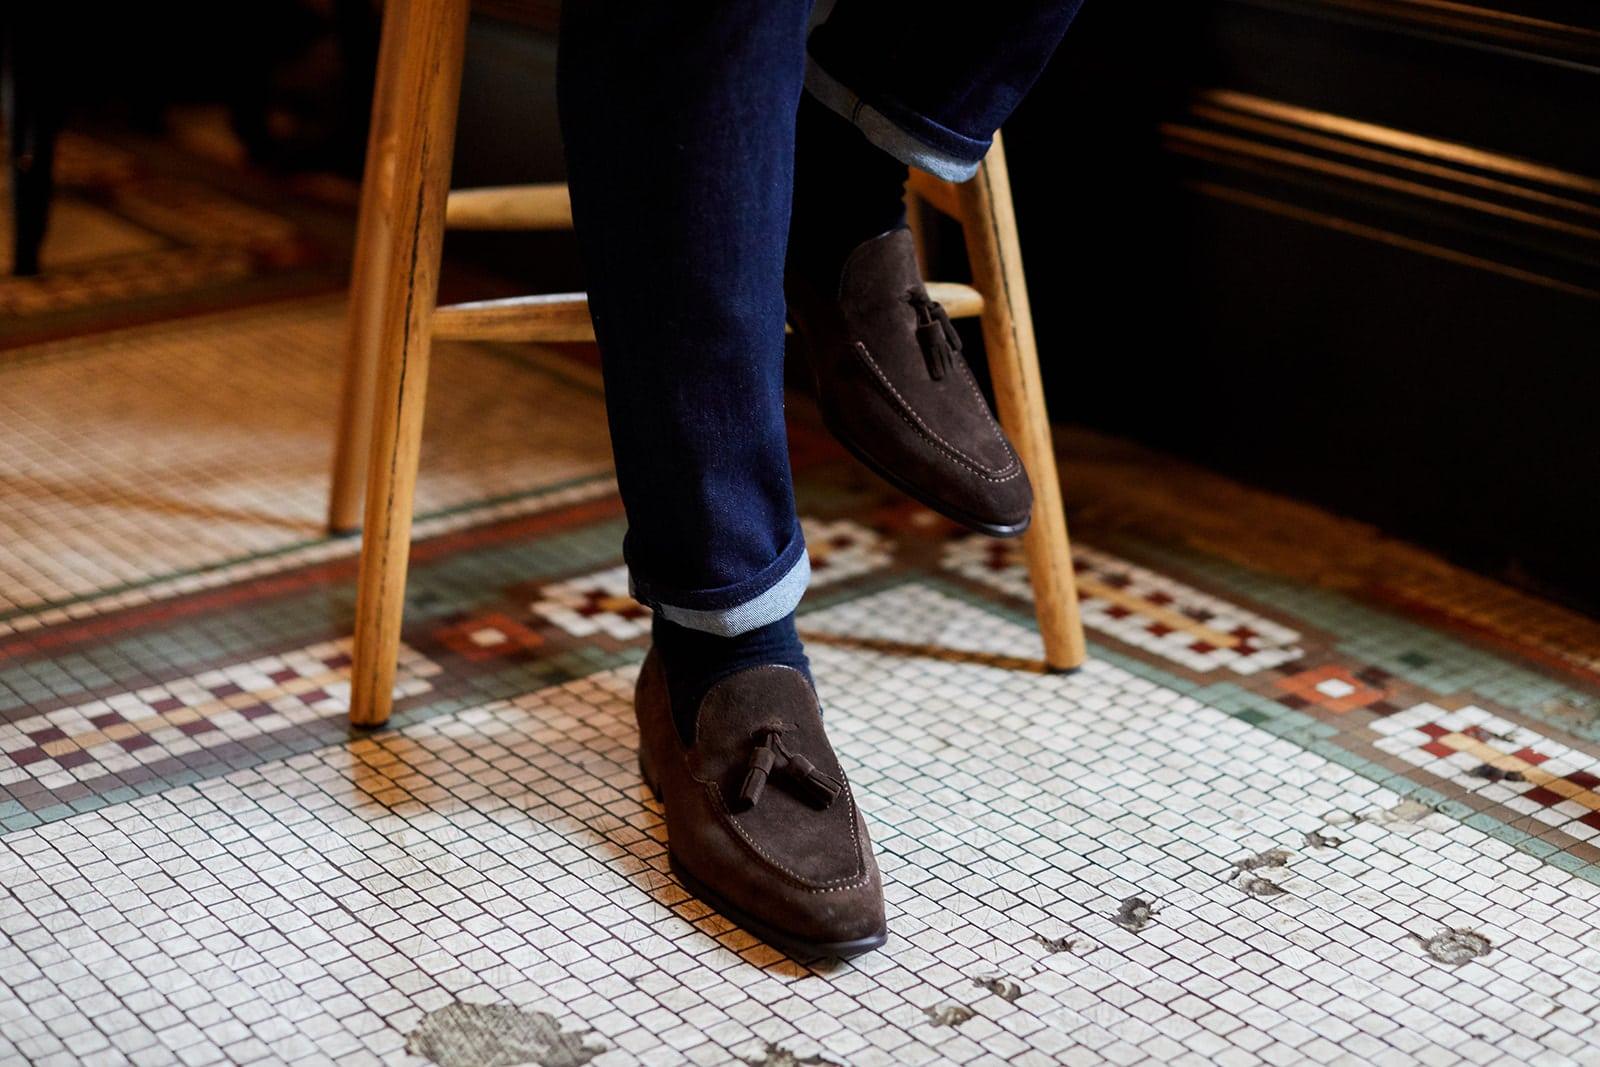 Donum Men's Chocolate Tassle Loafers